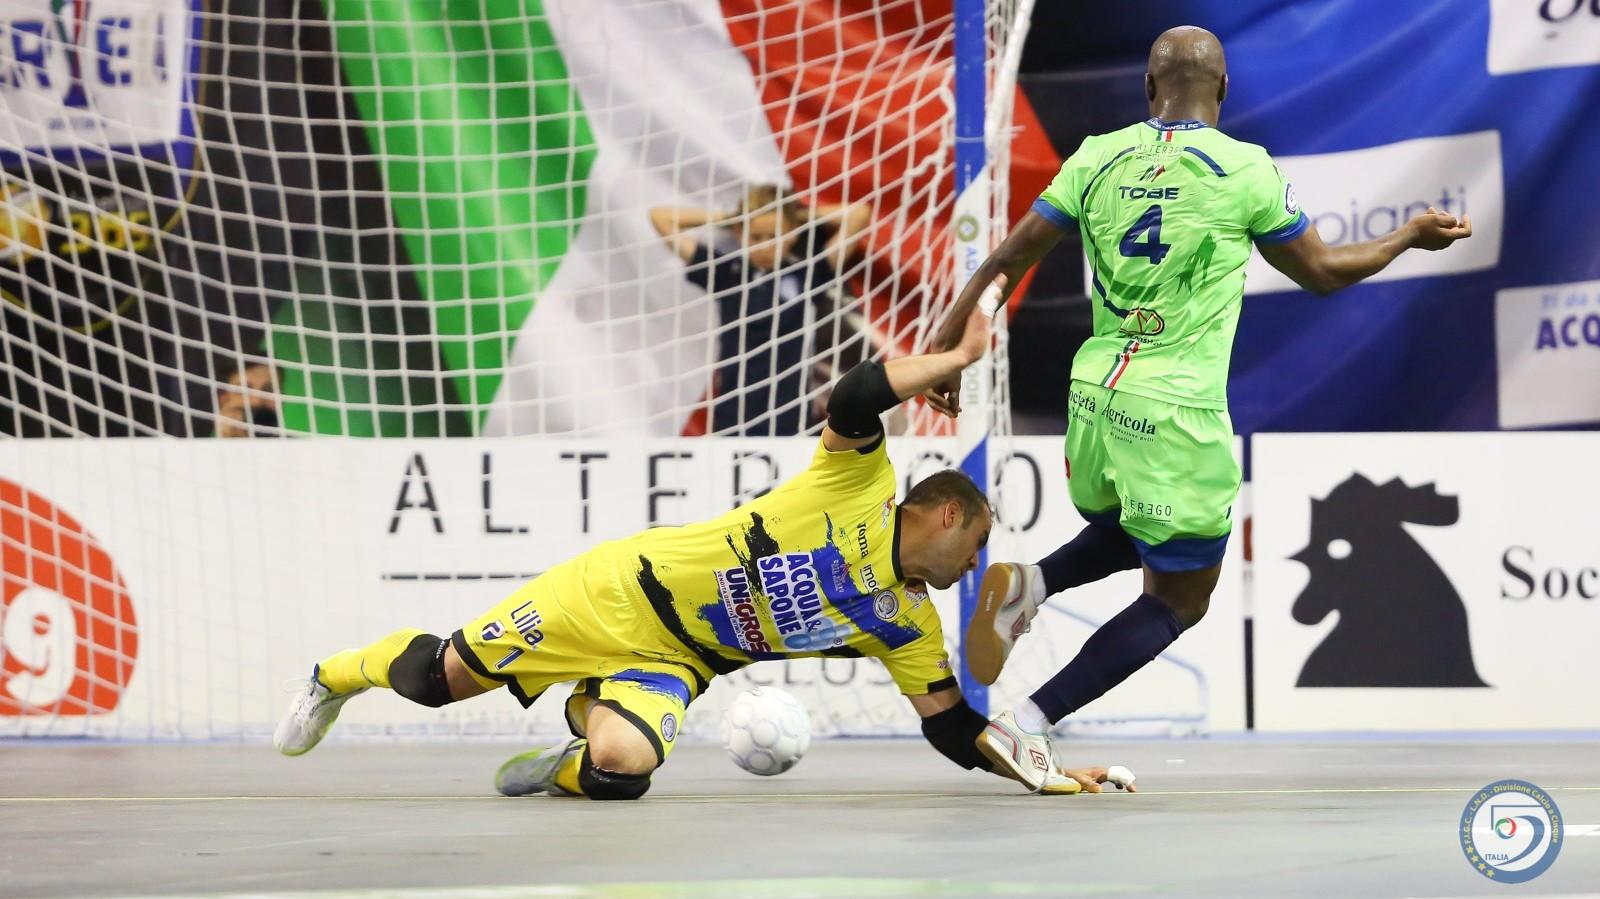 Finali calcio a 5, gara2: Luparense-Acqua&Sapone | Video